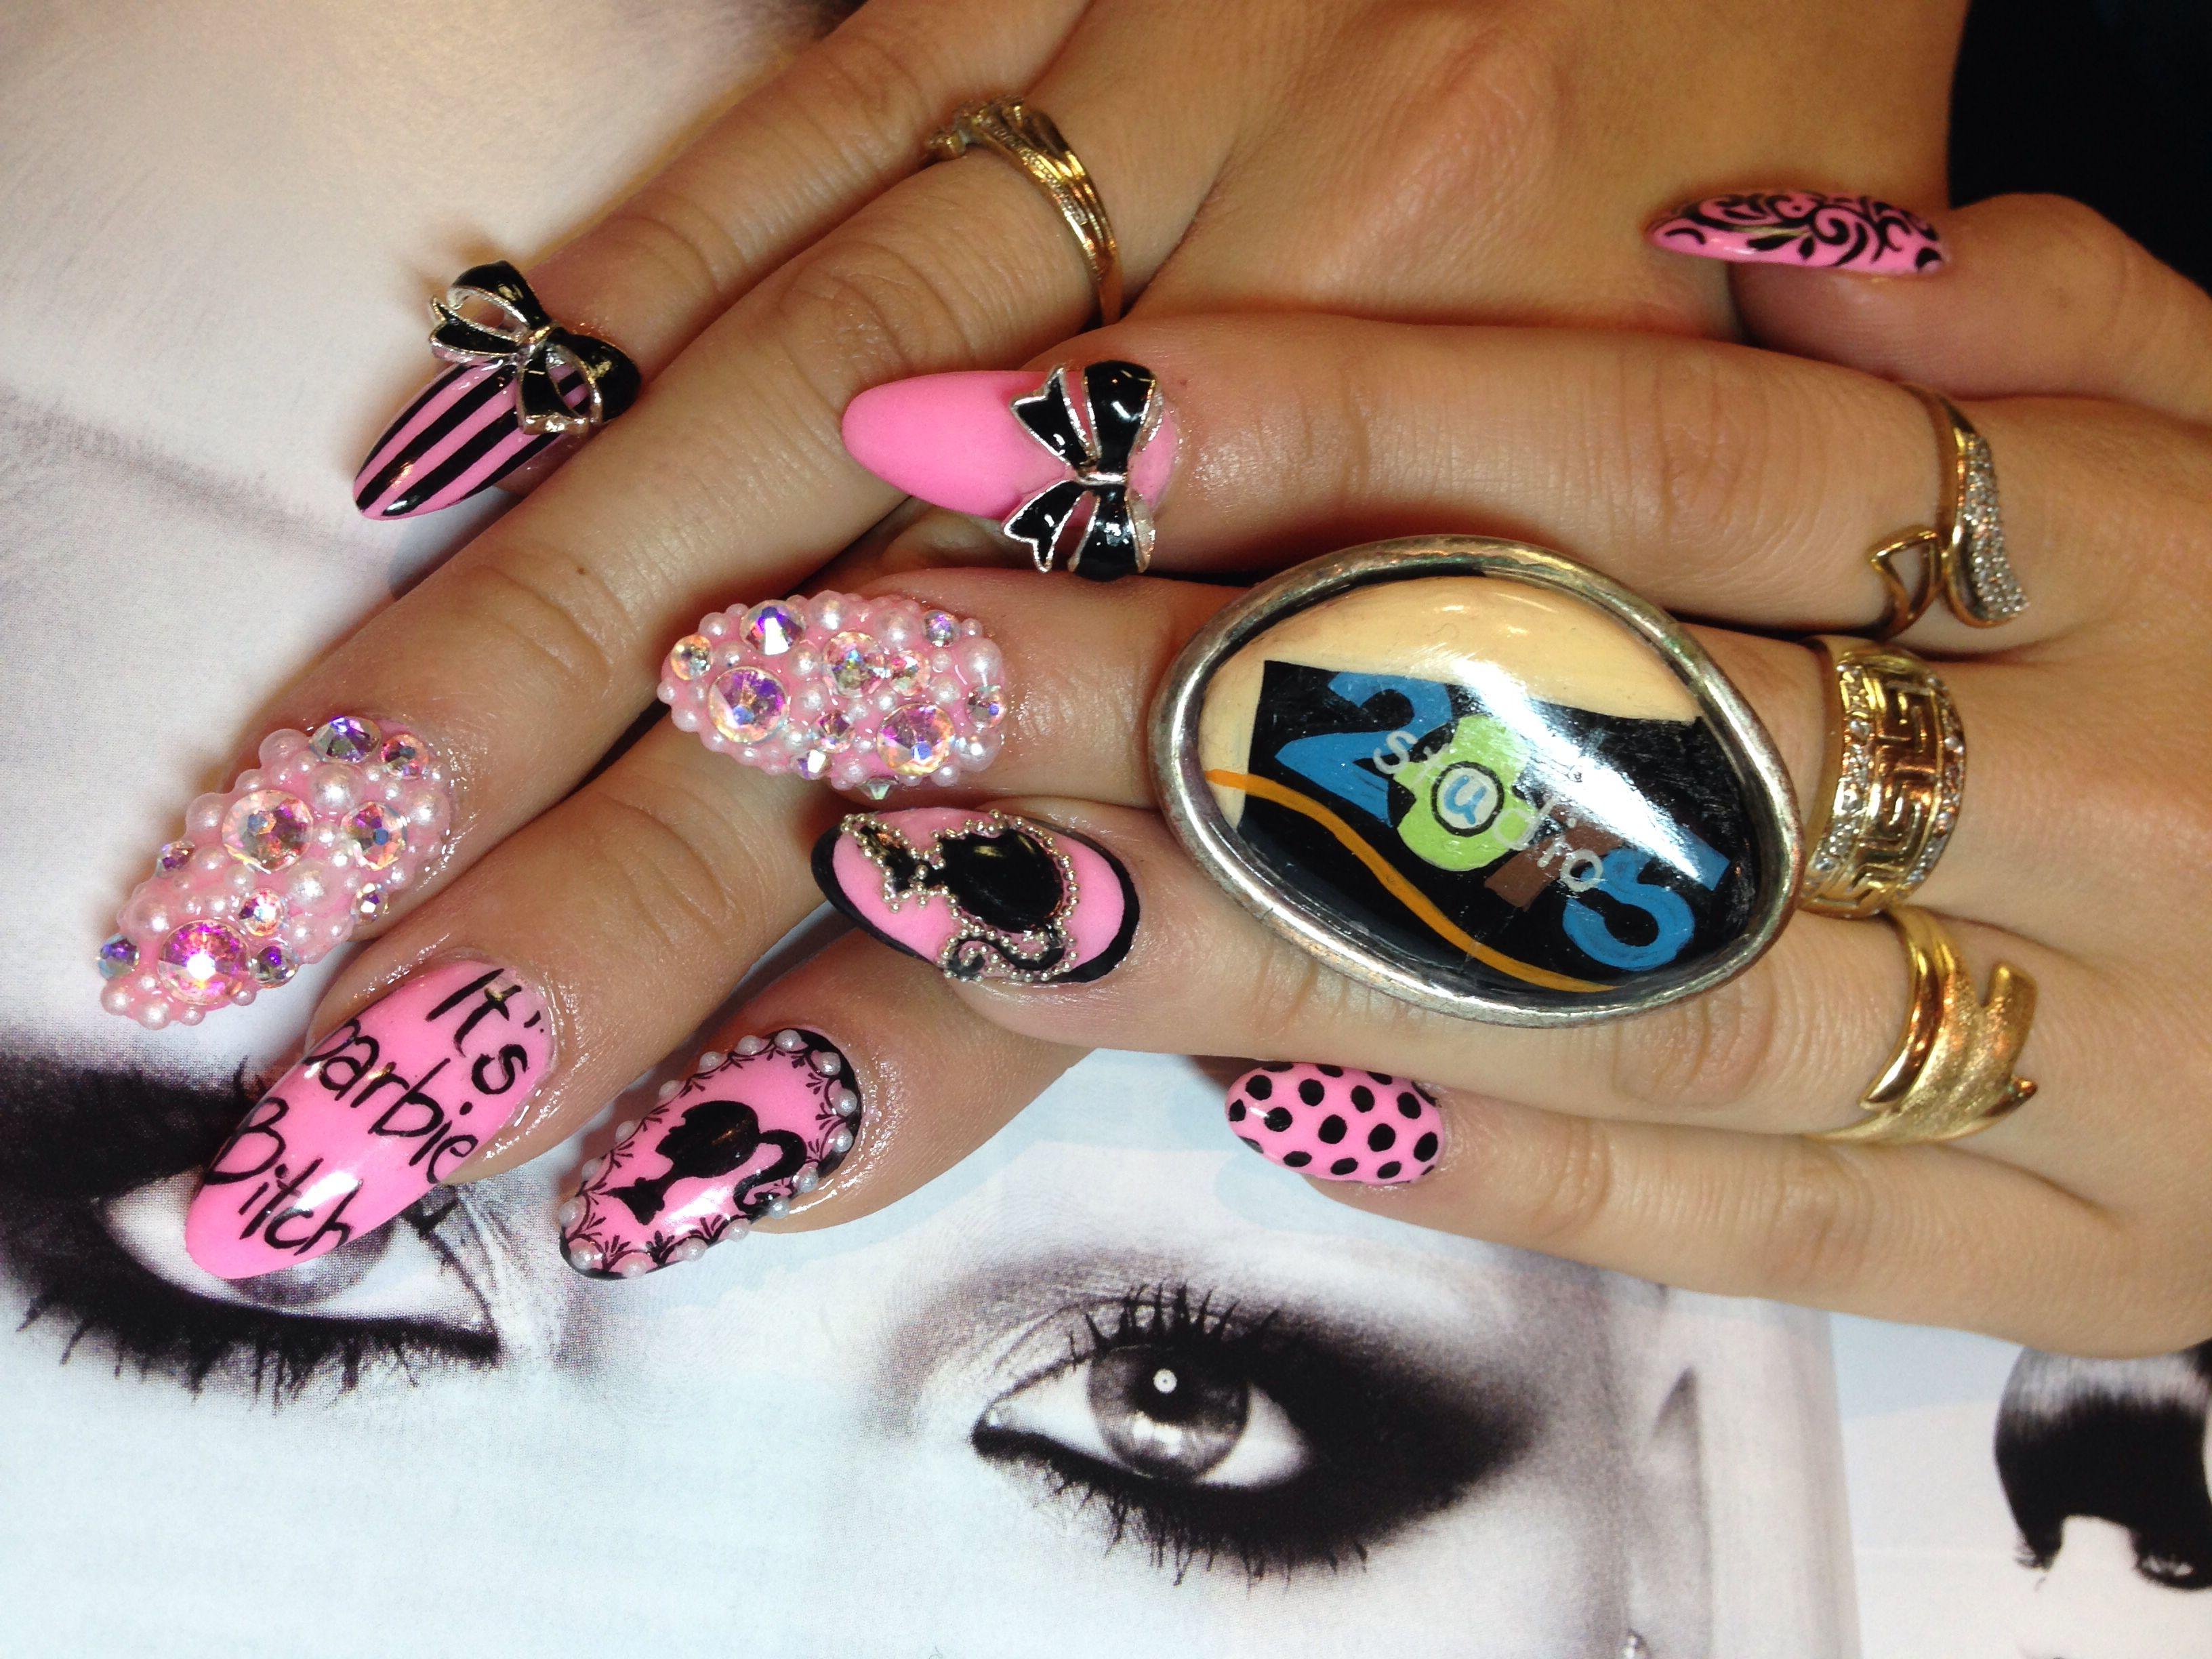 nails art valerie ducharme creation